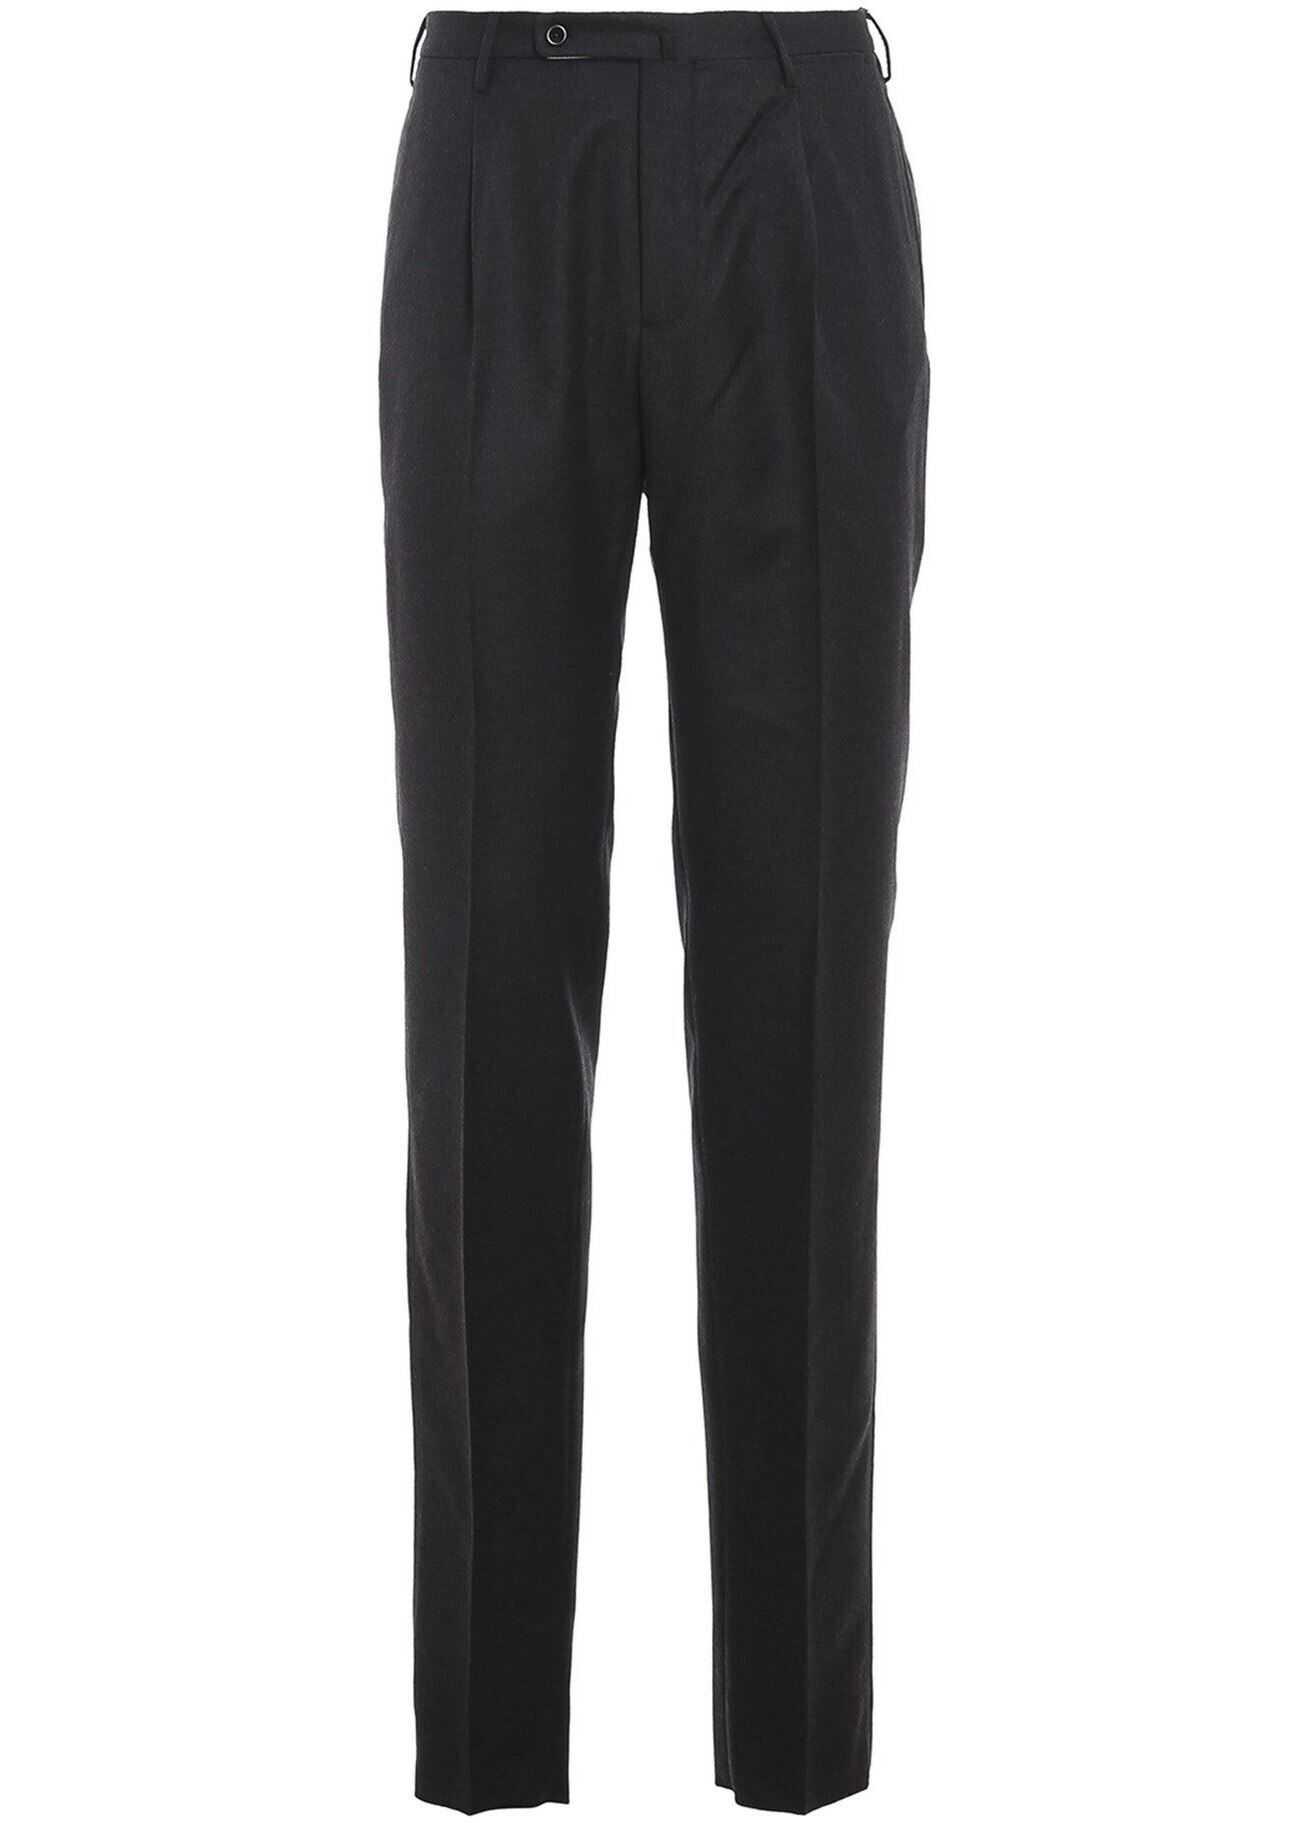 Incotex Super 100'S Trousers In Grey Grey imagine